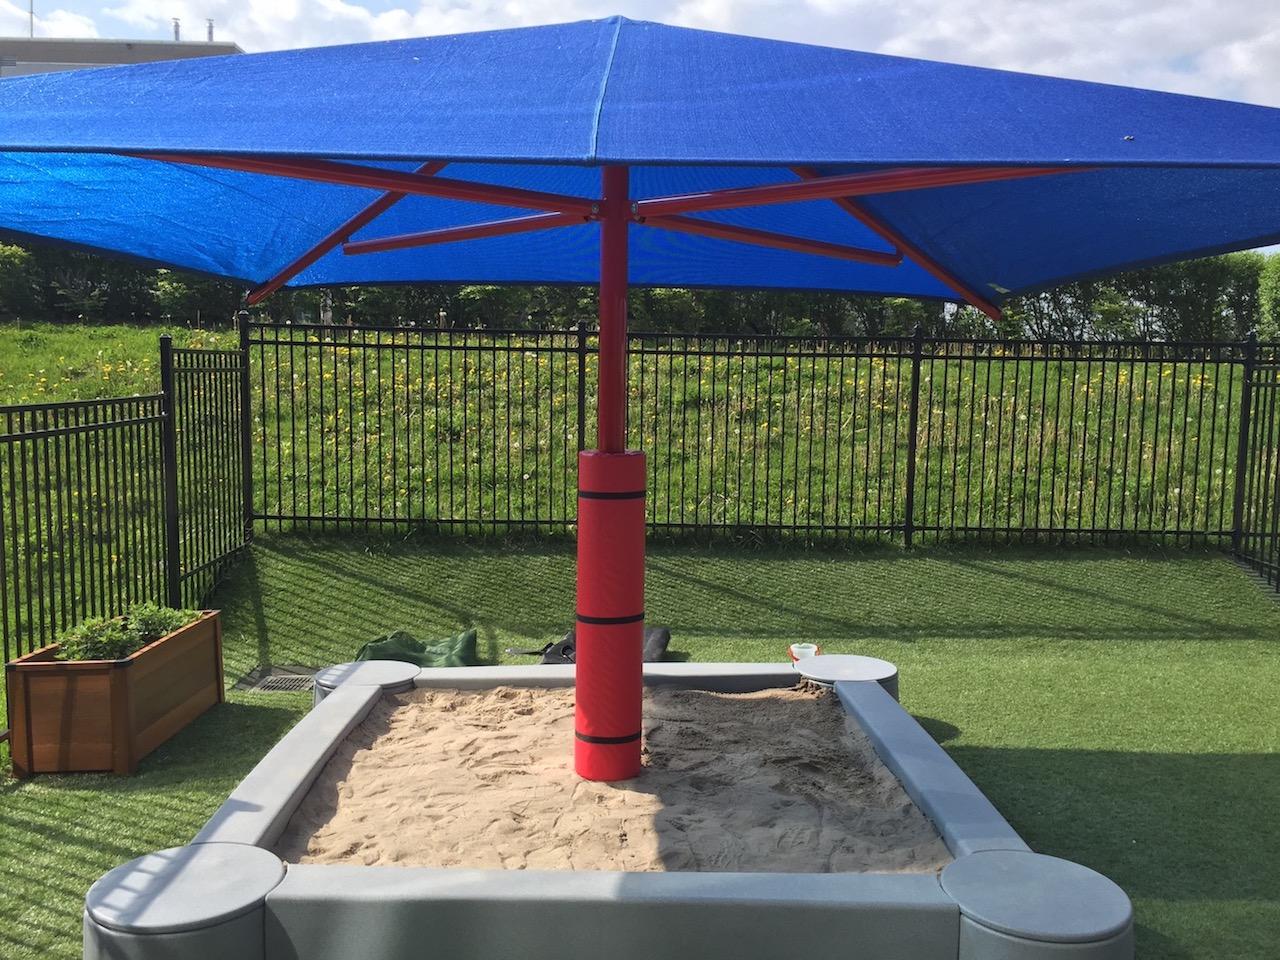 Blue Playground Shade Umbrella